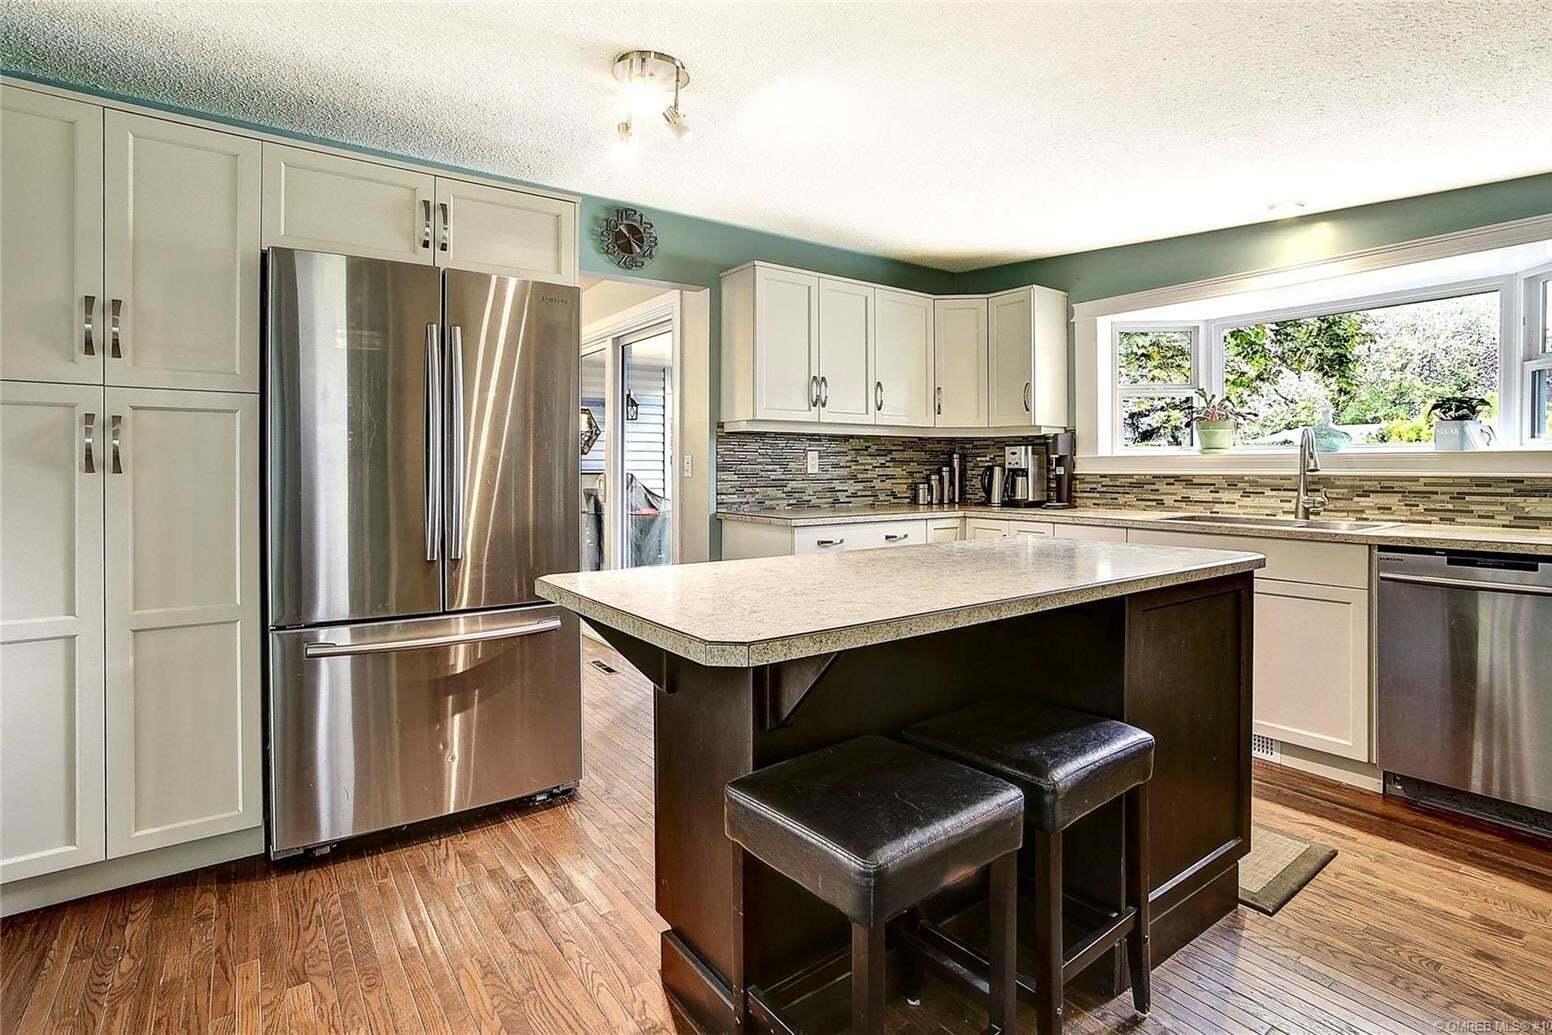 House for sale at 975 Fairway Cres Kelowna British Columbia - MLS: 10214598